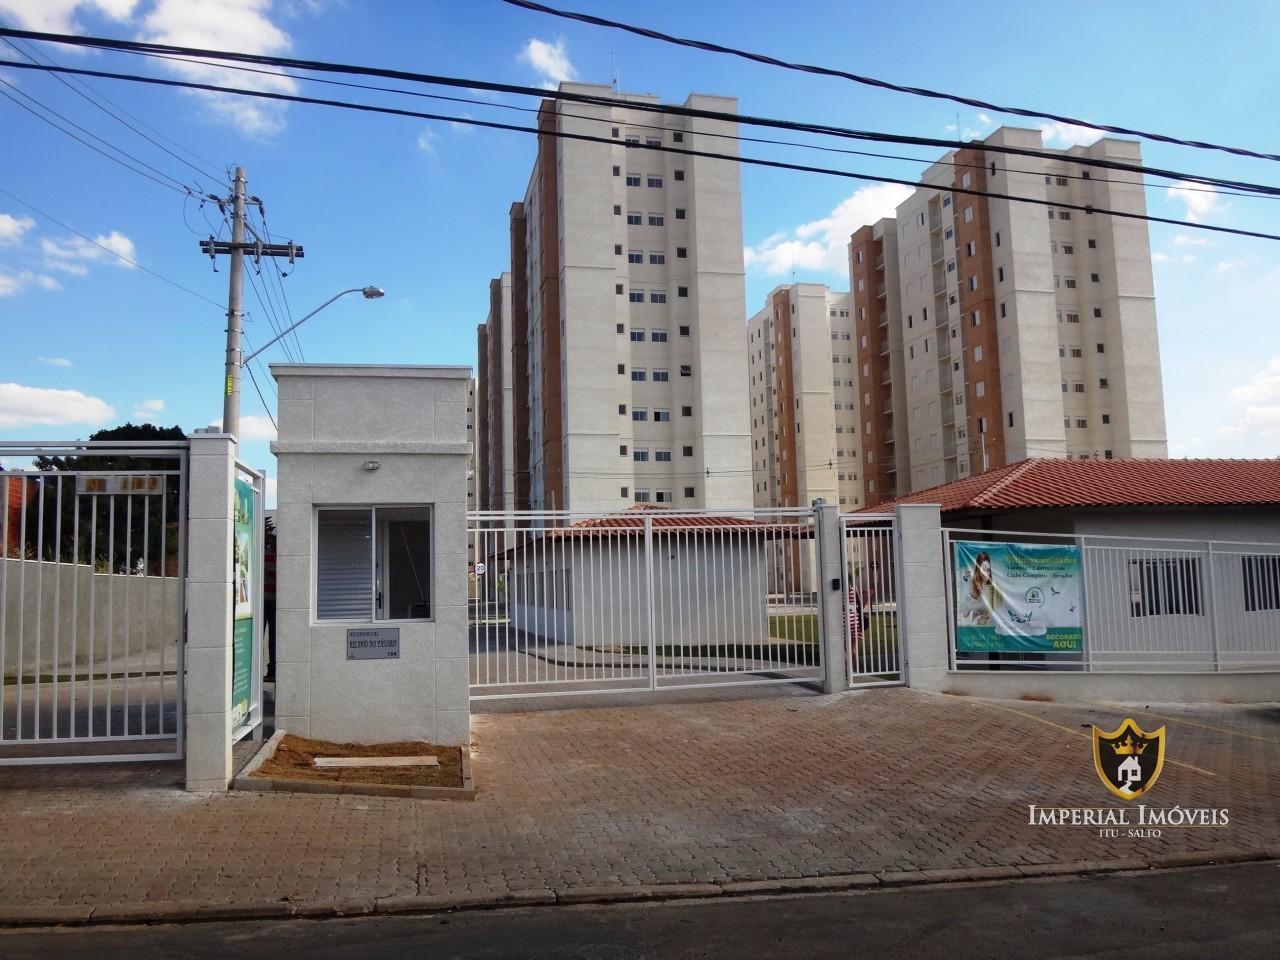 comfortable-apartment-good-study-environment-easy-mobility-7ccdadaff8f313b91efb46d84ddb1995